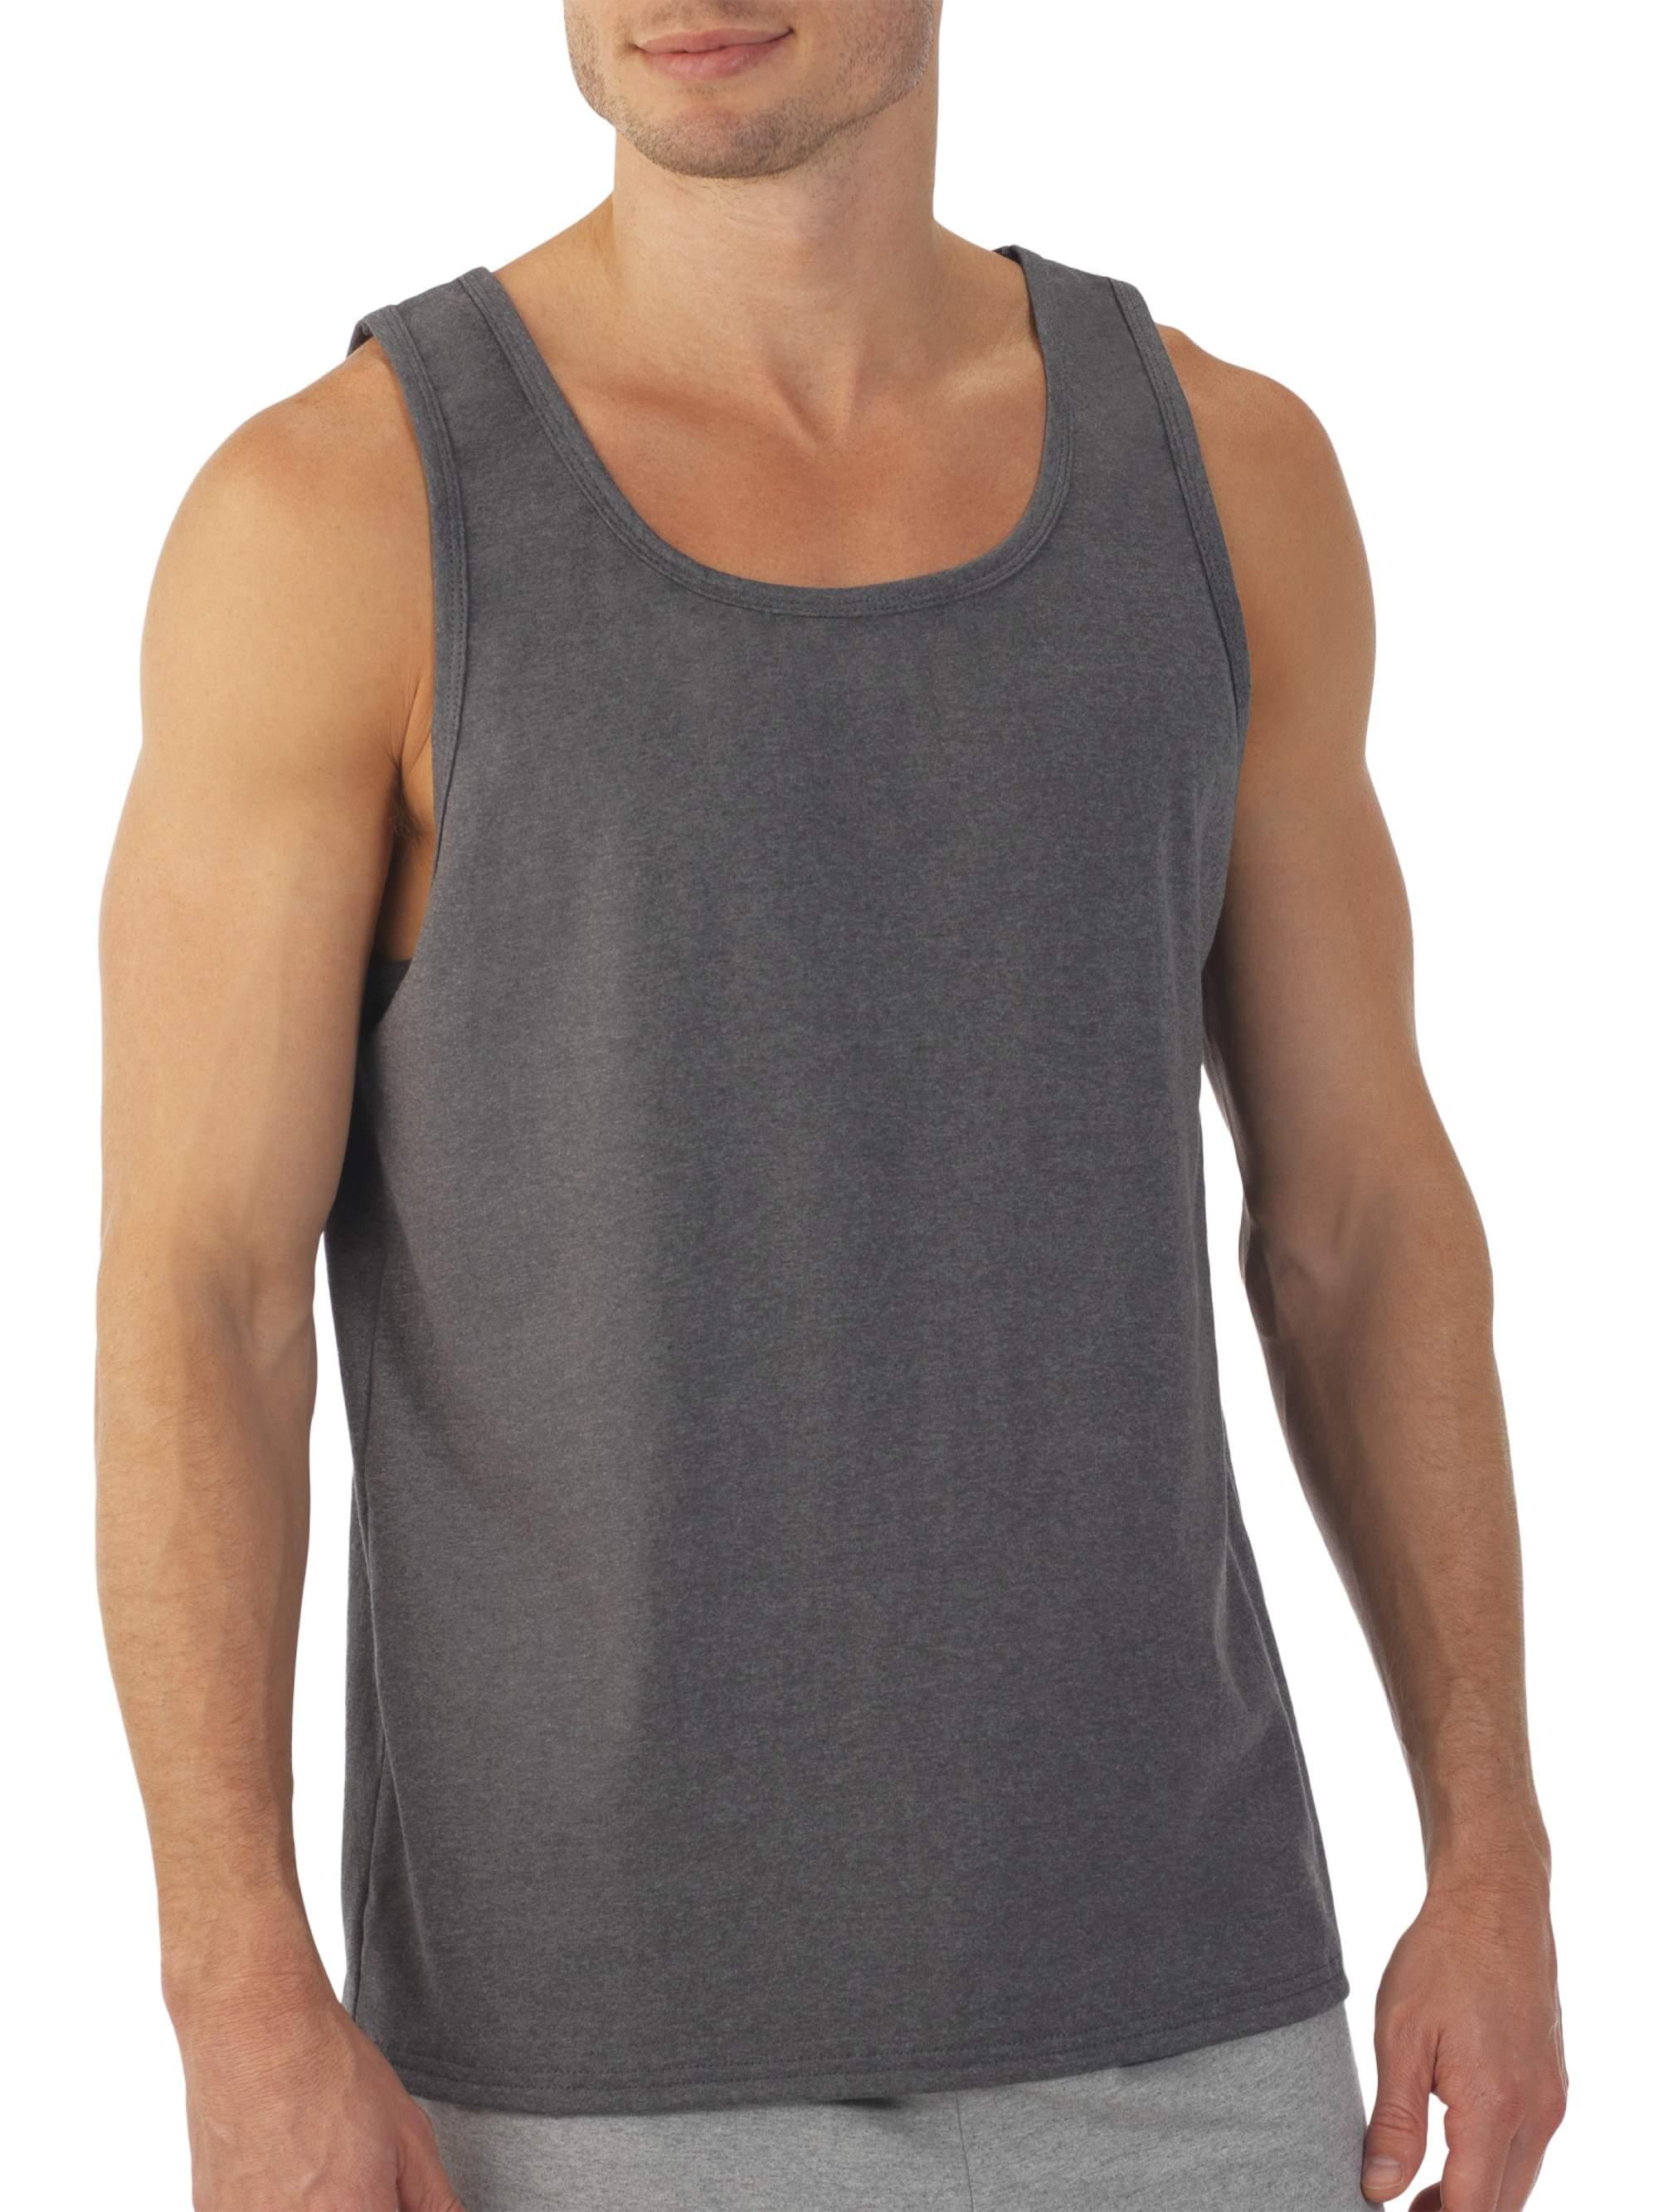 Men's Soft Jersey Tag Free Tank Top